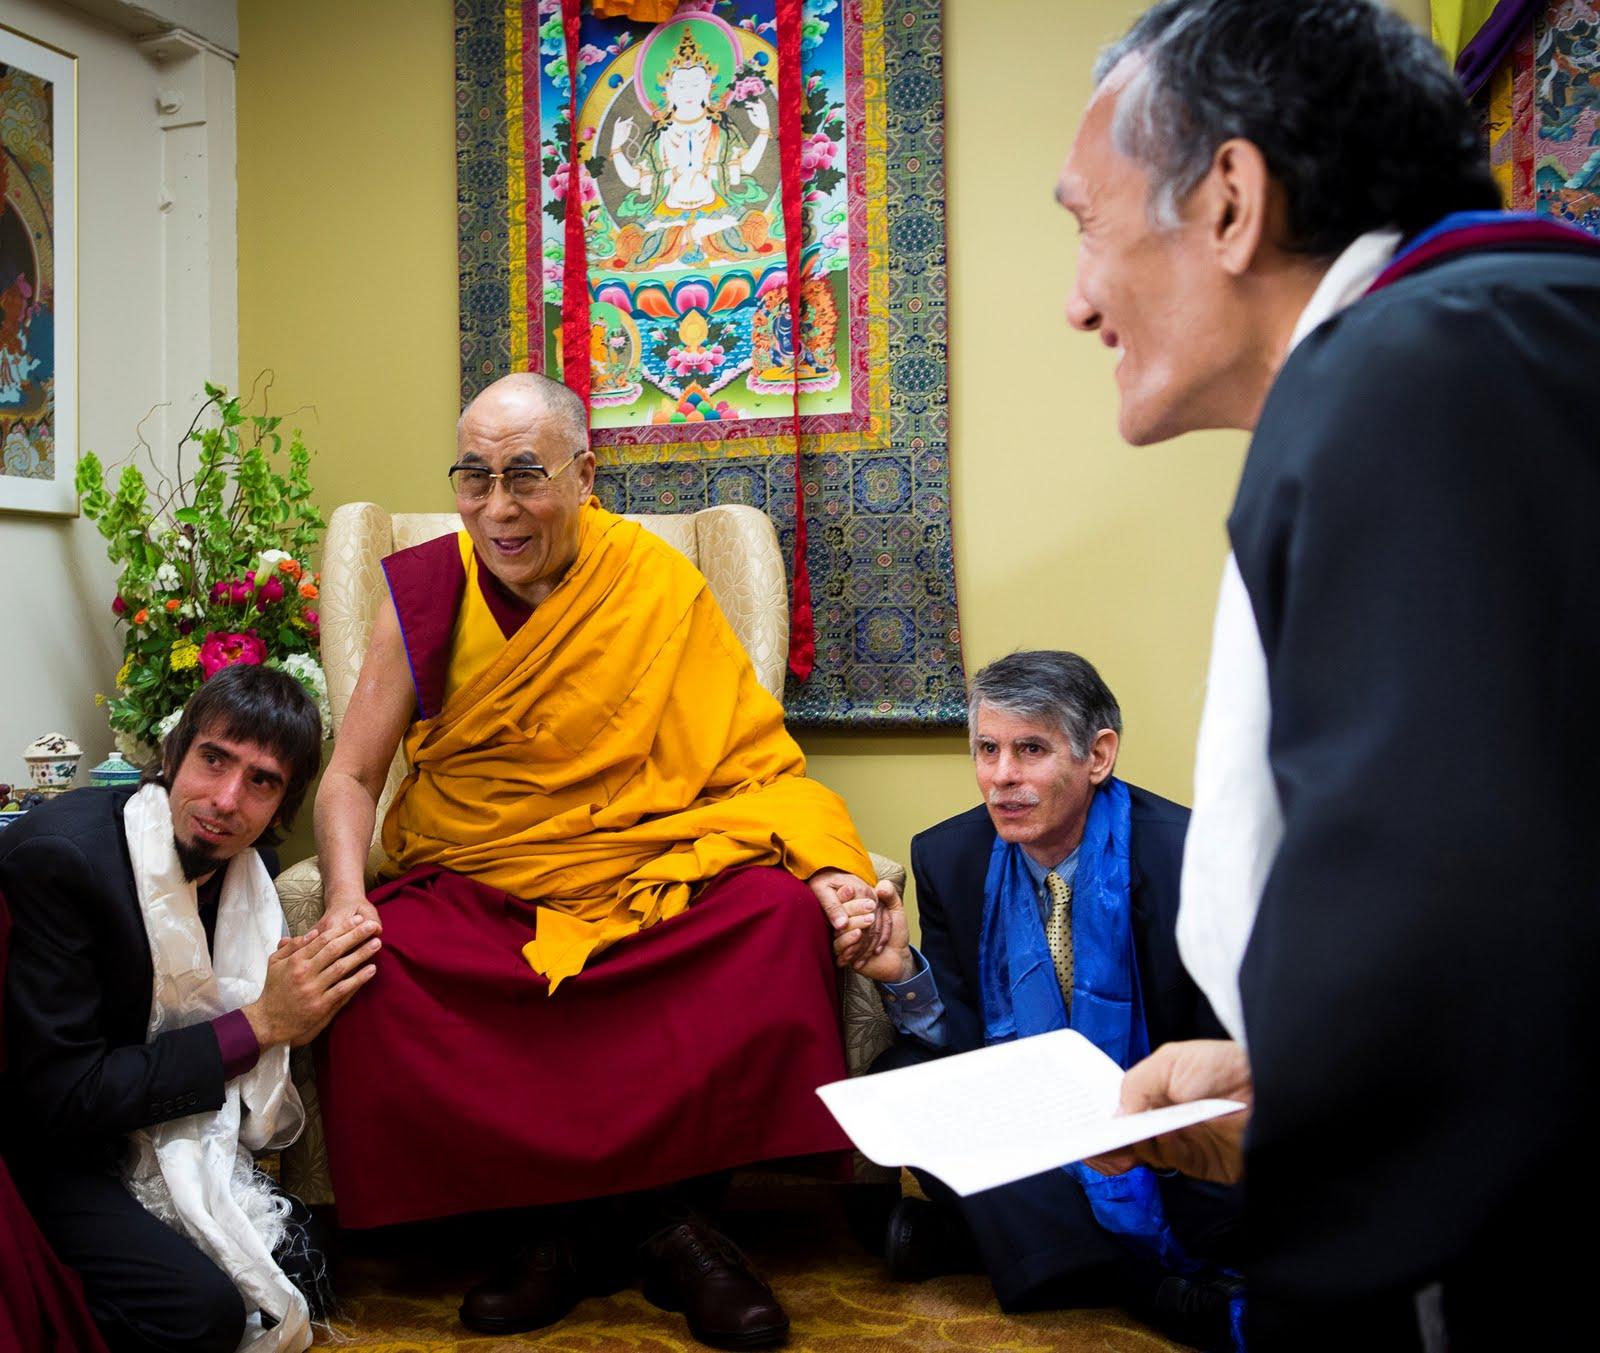 Tenzin Ösel Hita, His Holiness the Dalai Lama, FPMT International Office Director of Operations and Yangsi Rinpoche. Photo by Leah Nash.